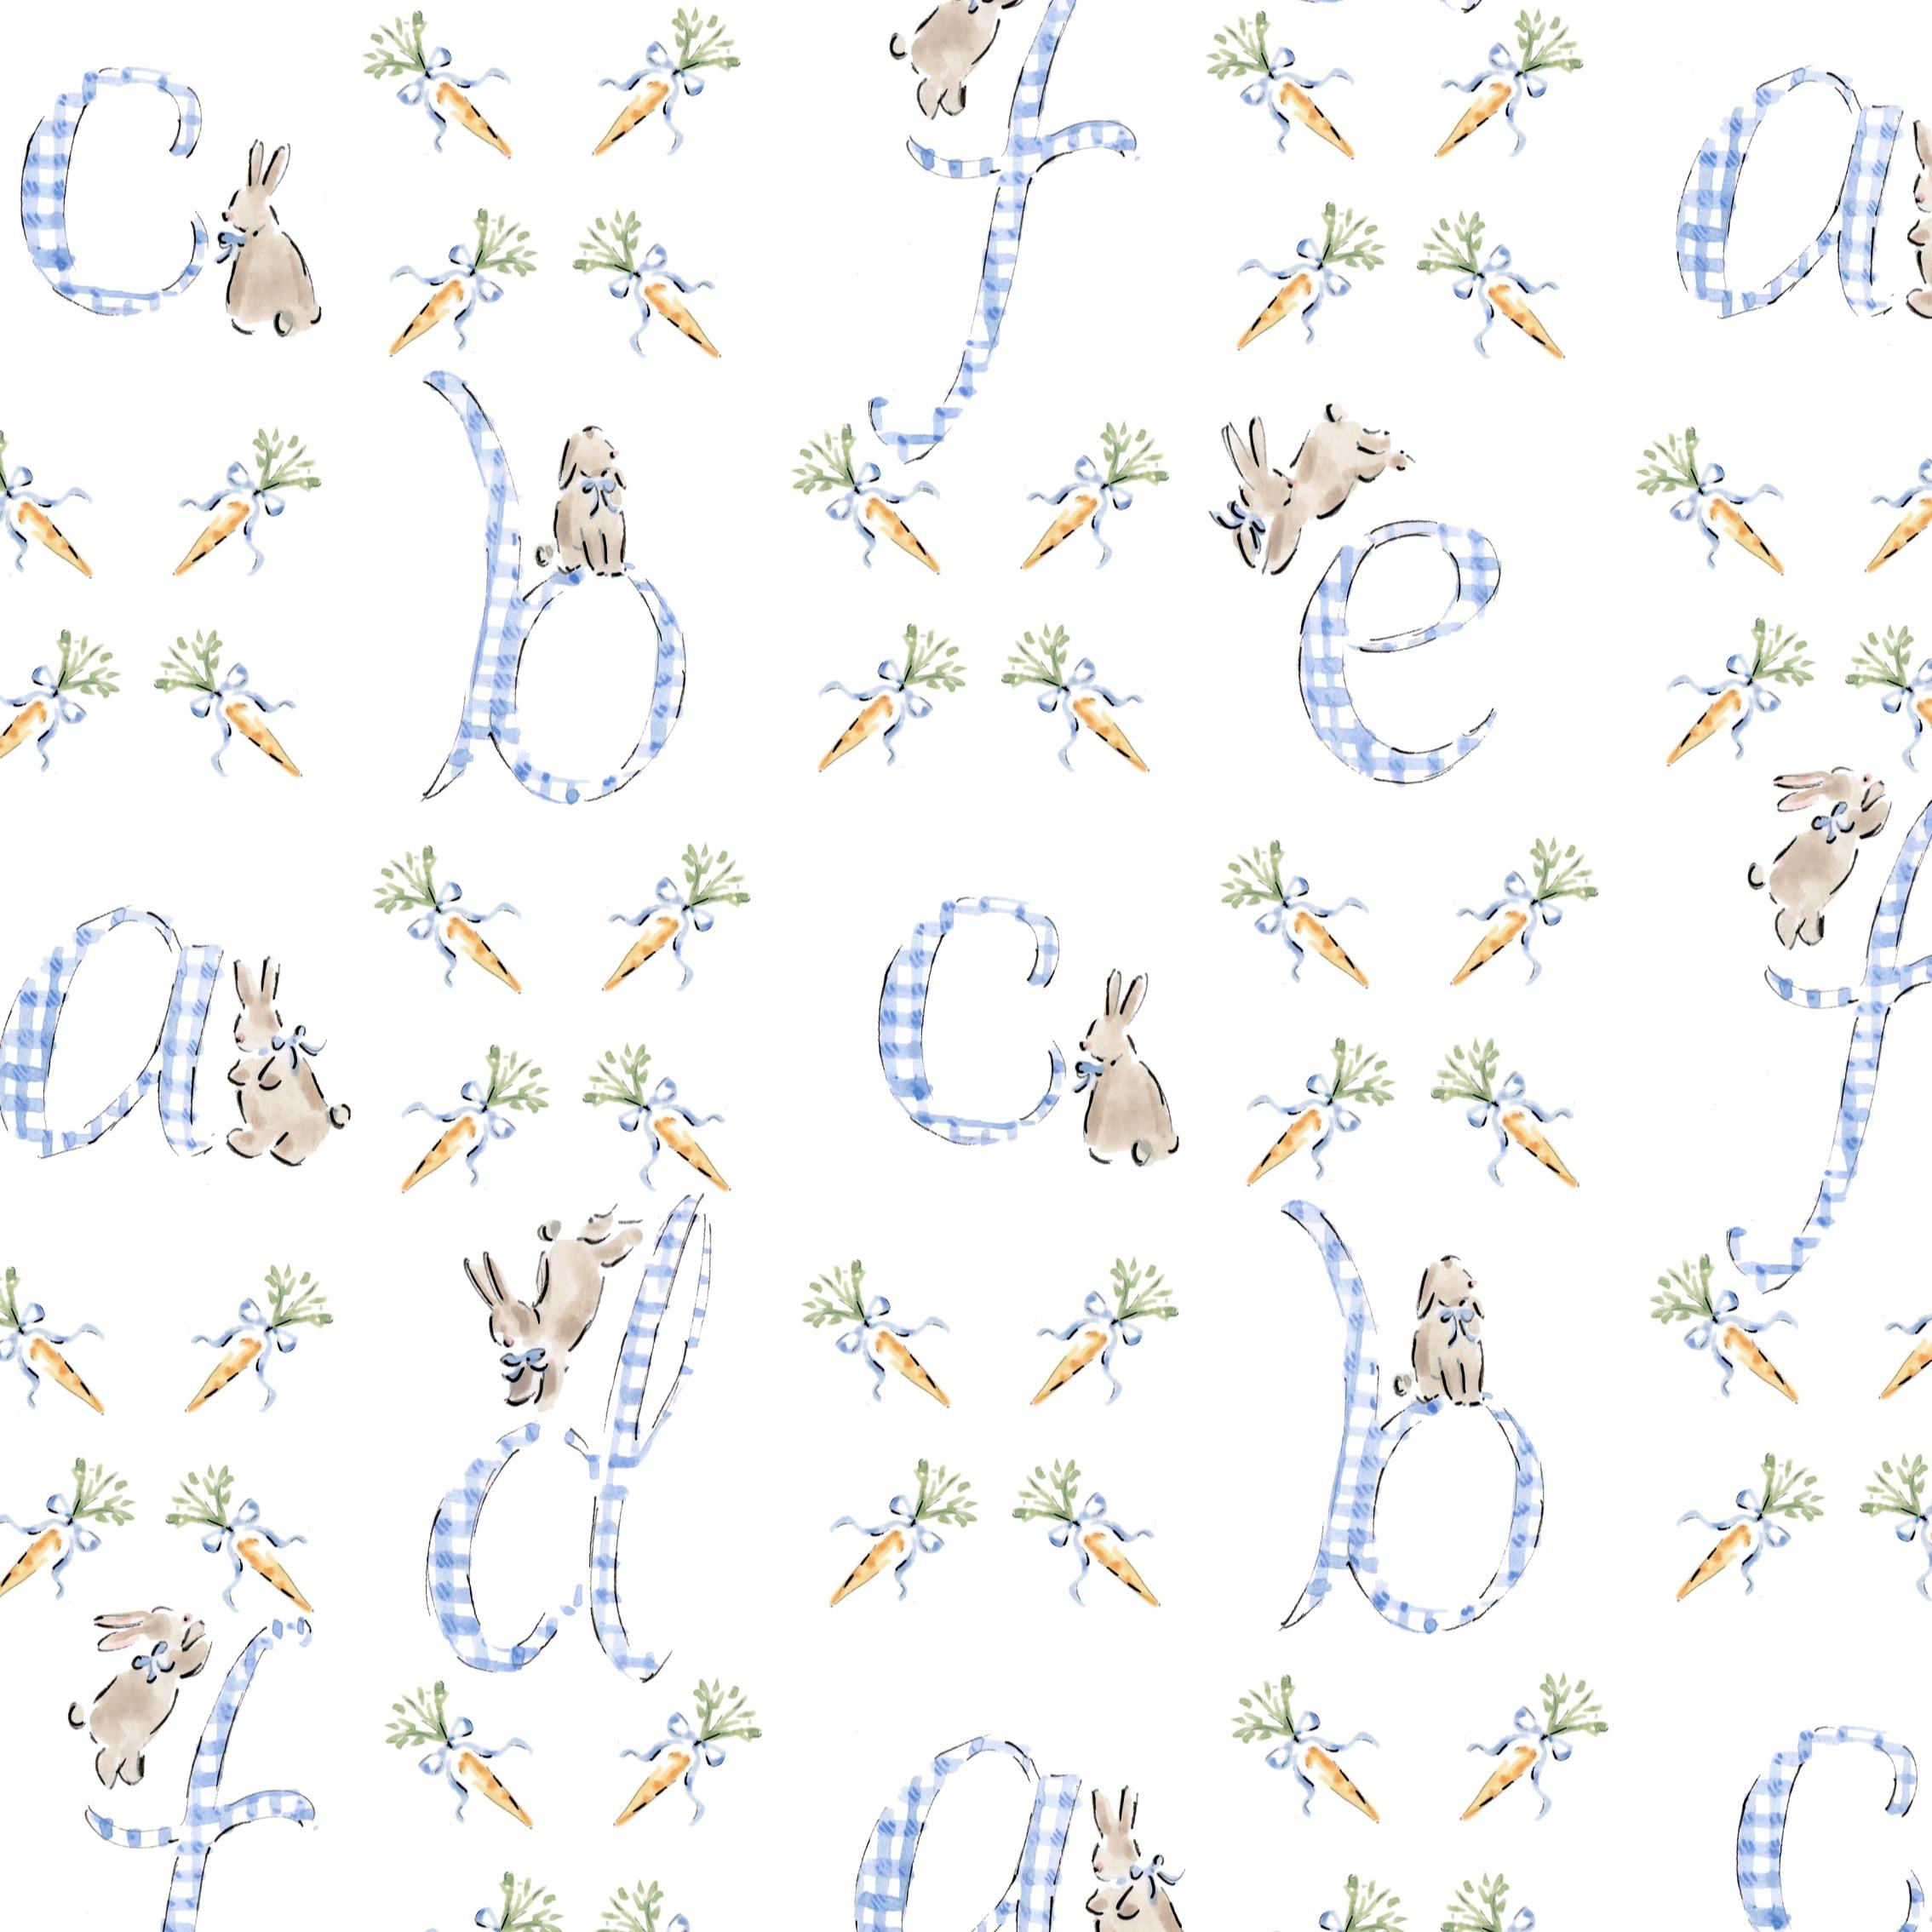 Alphabet pattern with bunnies